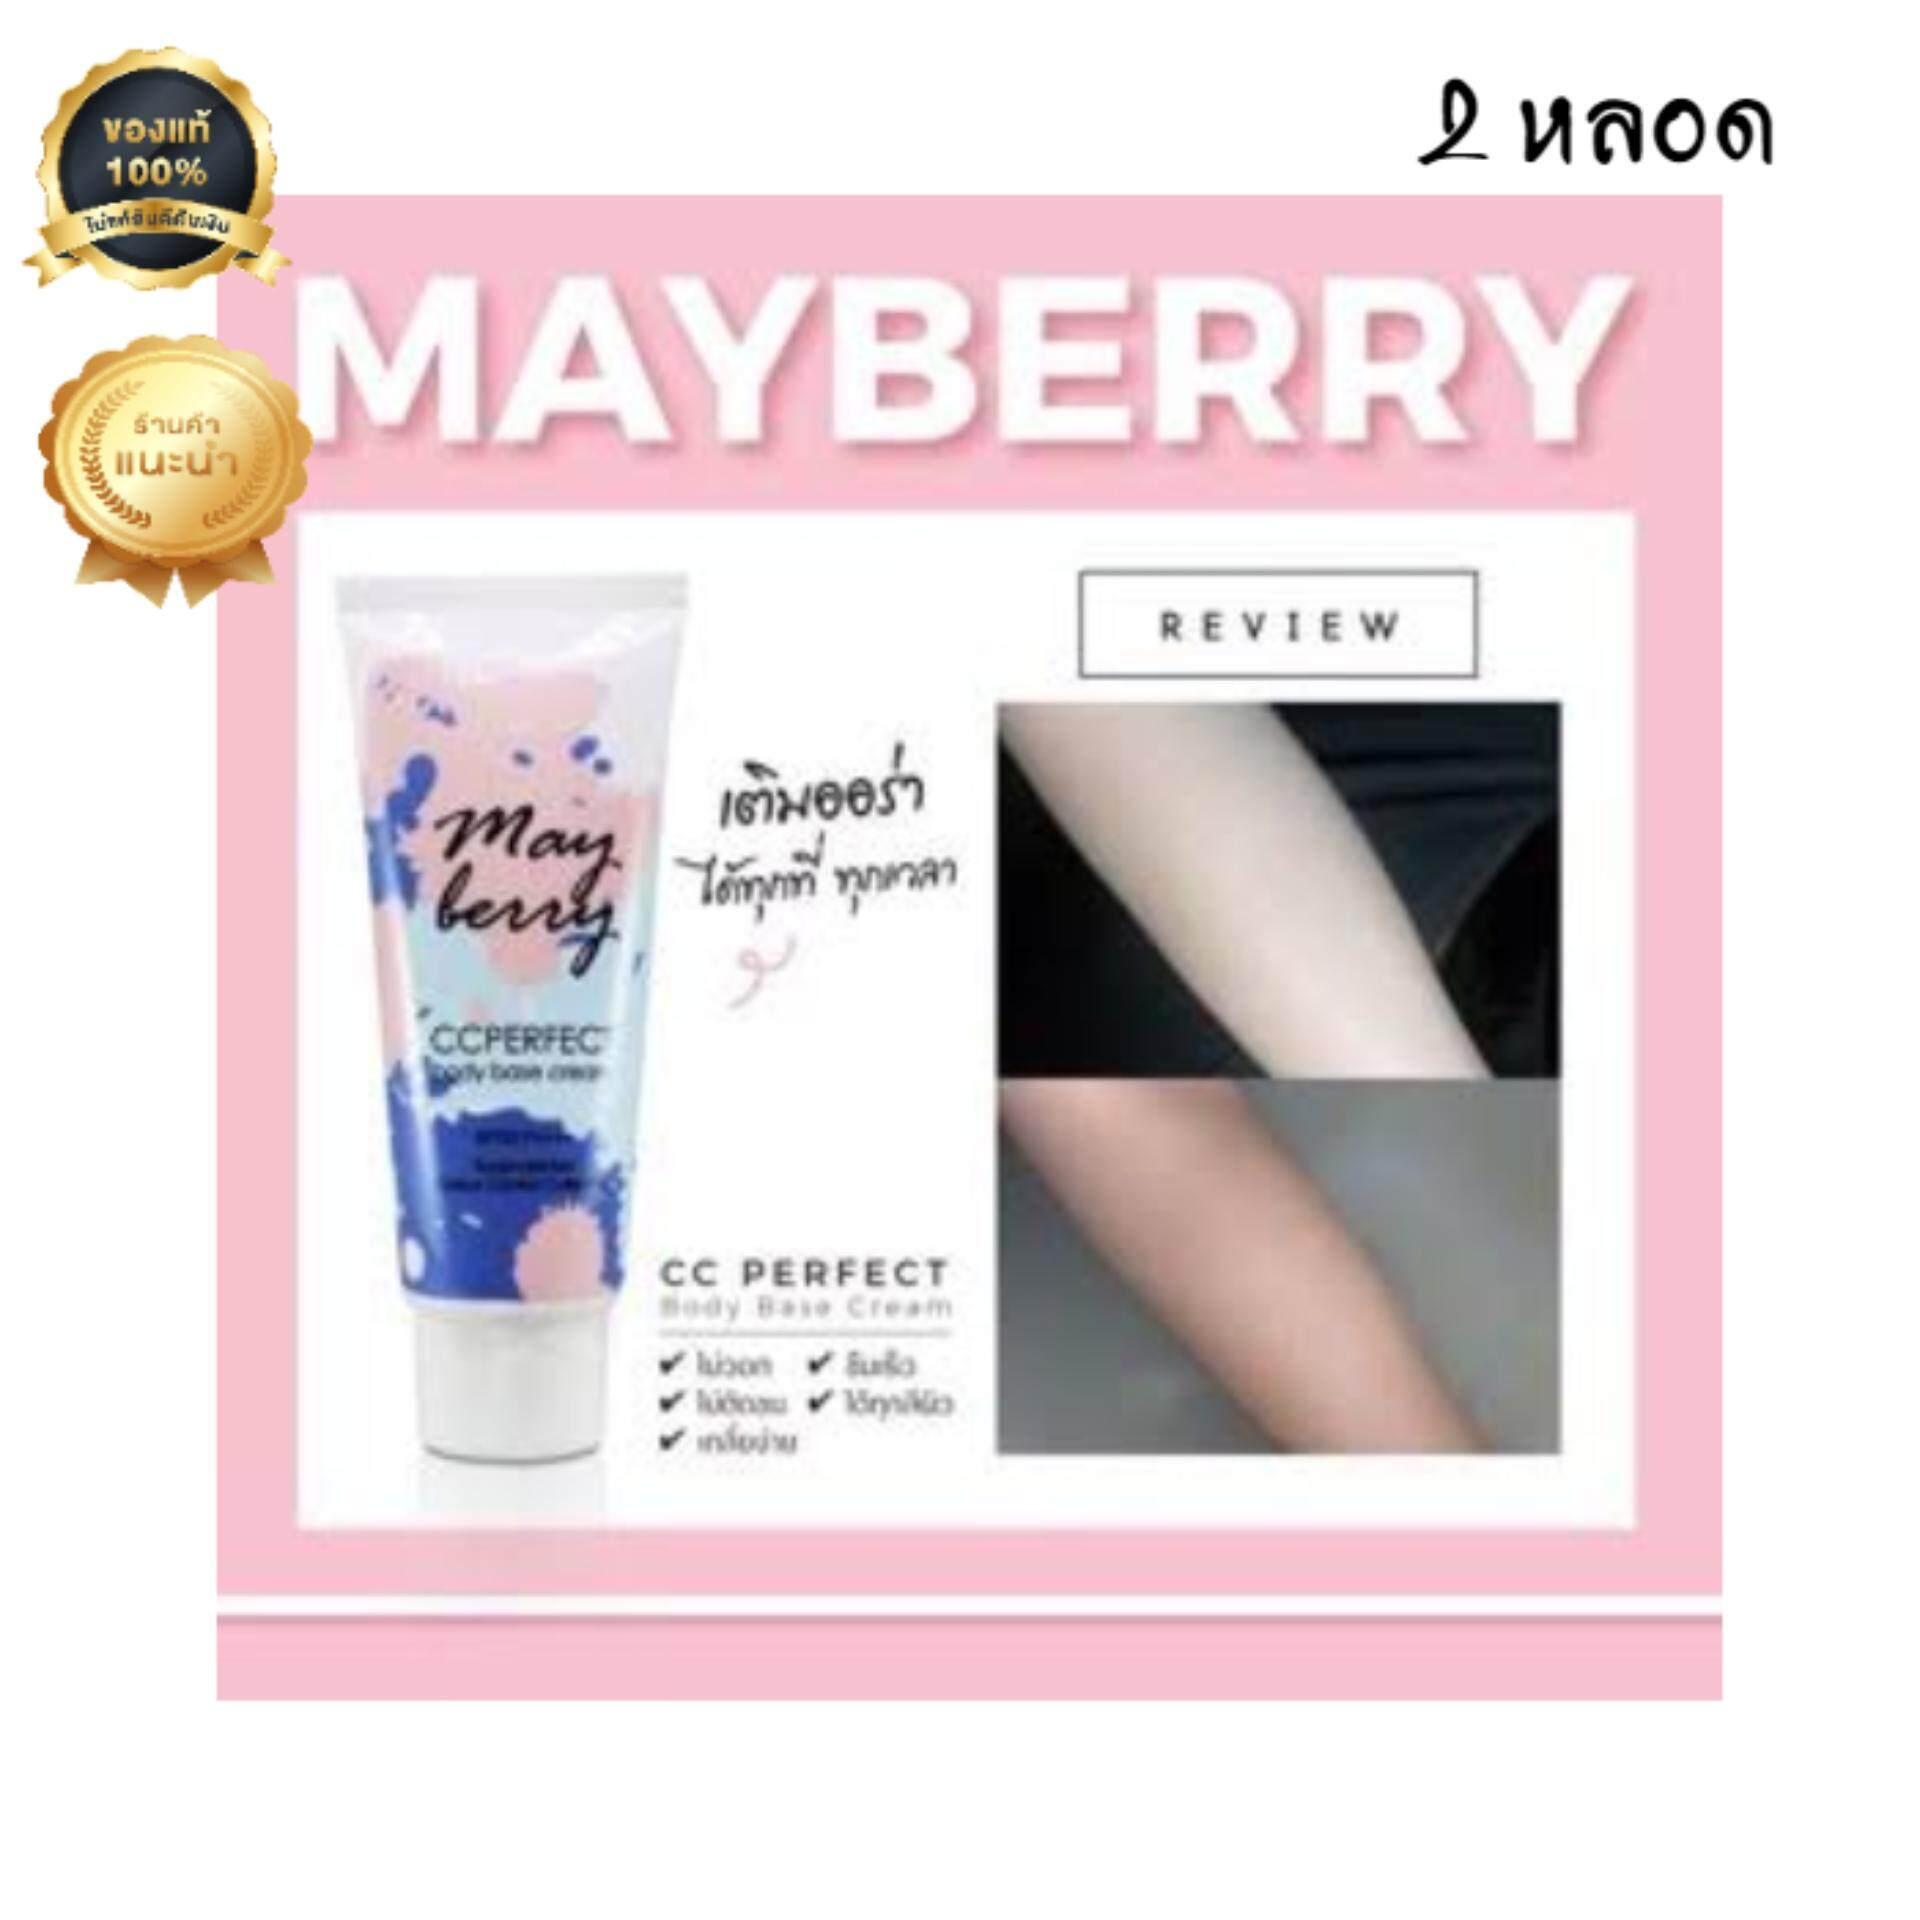 MayBerry CC Perfect Body Base Cream เมเบอร์รี่ ซีซี ครีม ขนาด 120 กรัม (2 หลอด)